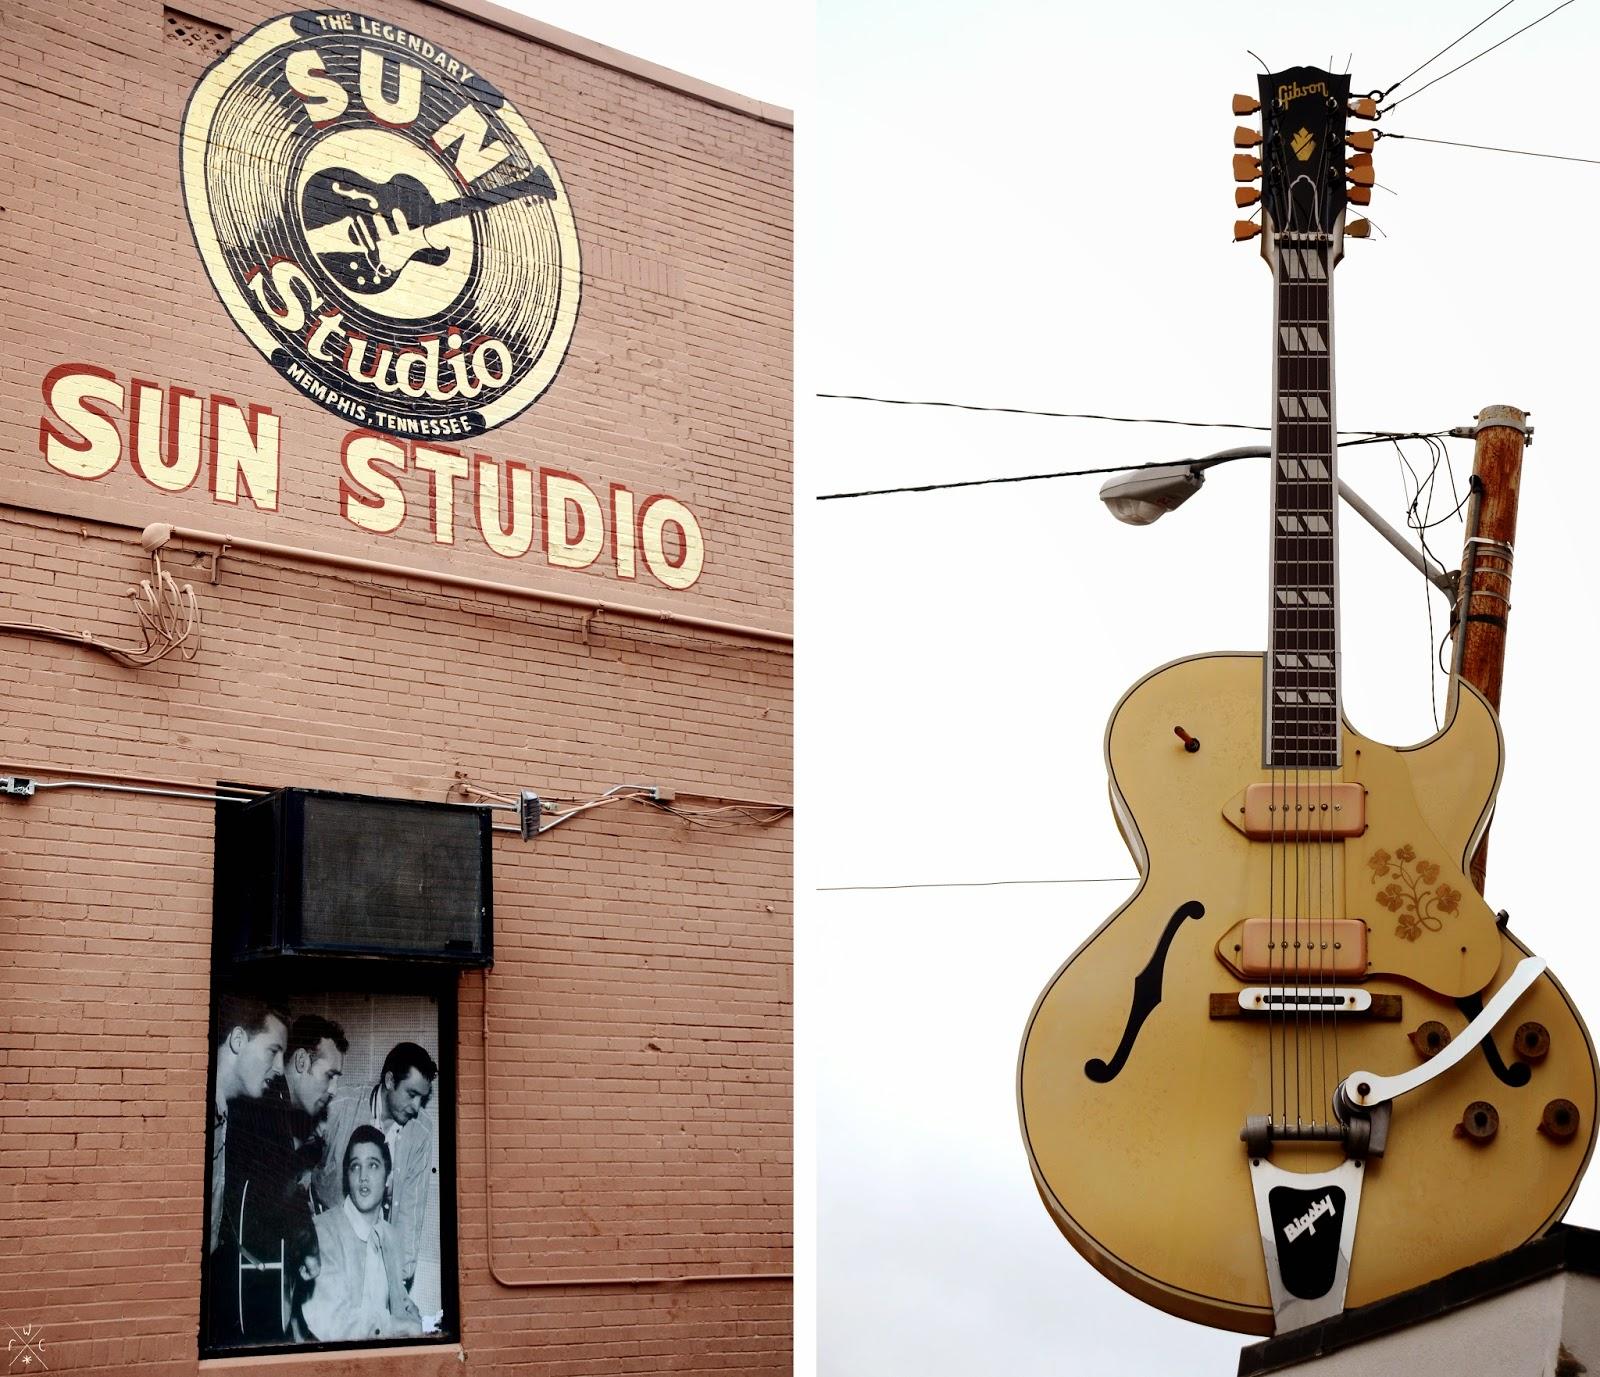 Sun Studio - Memphis - Tennessee - USA